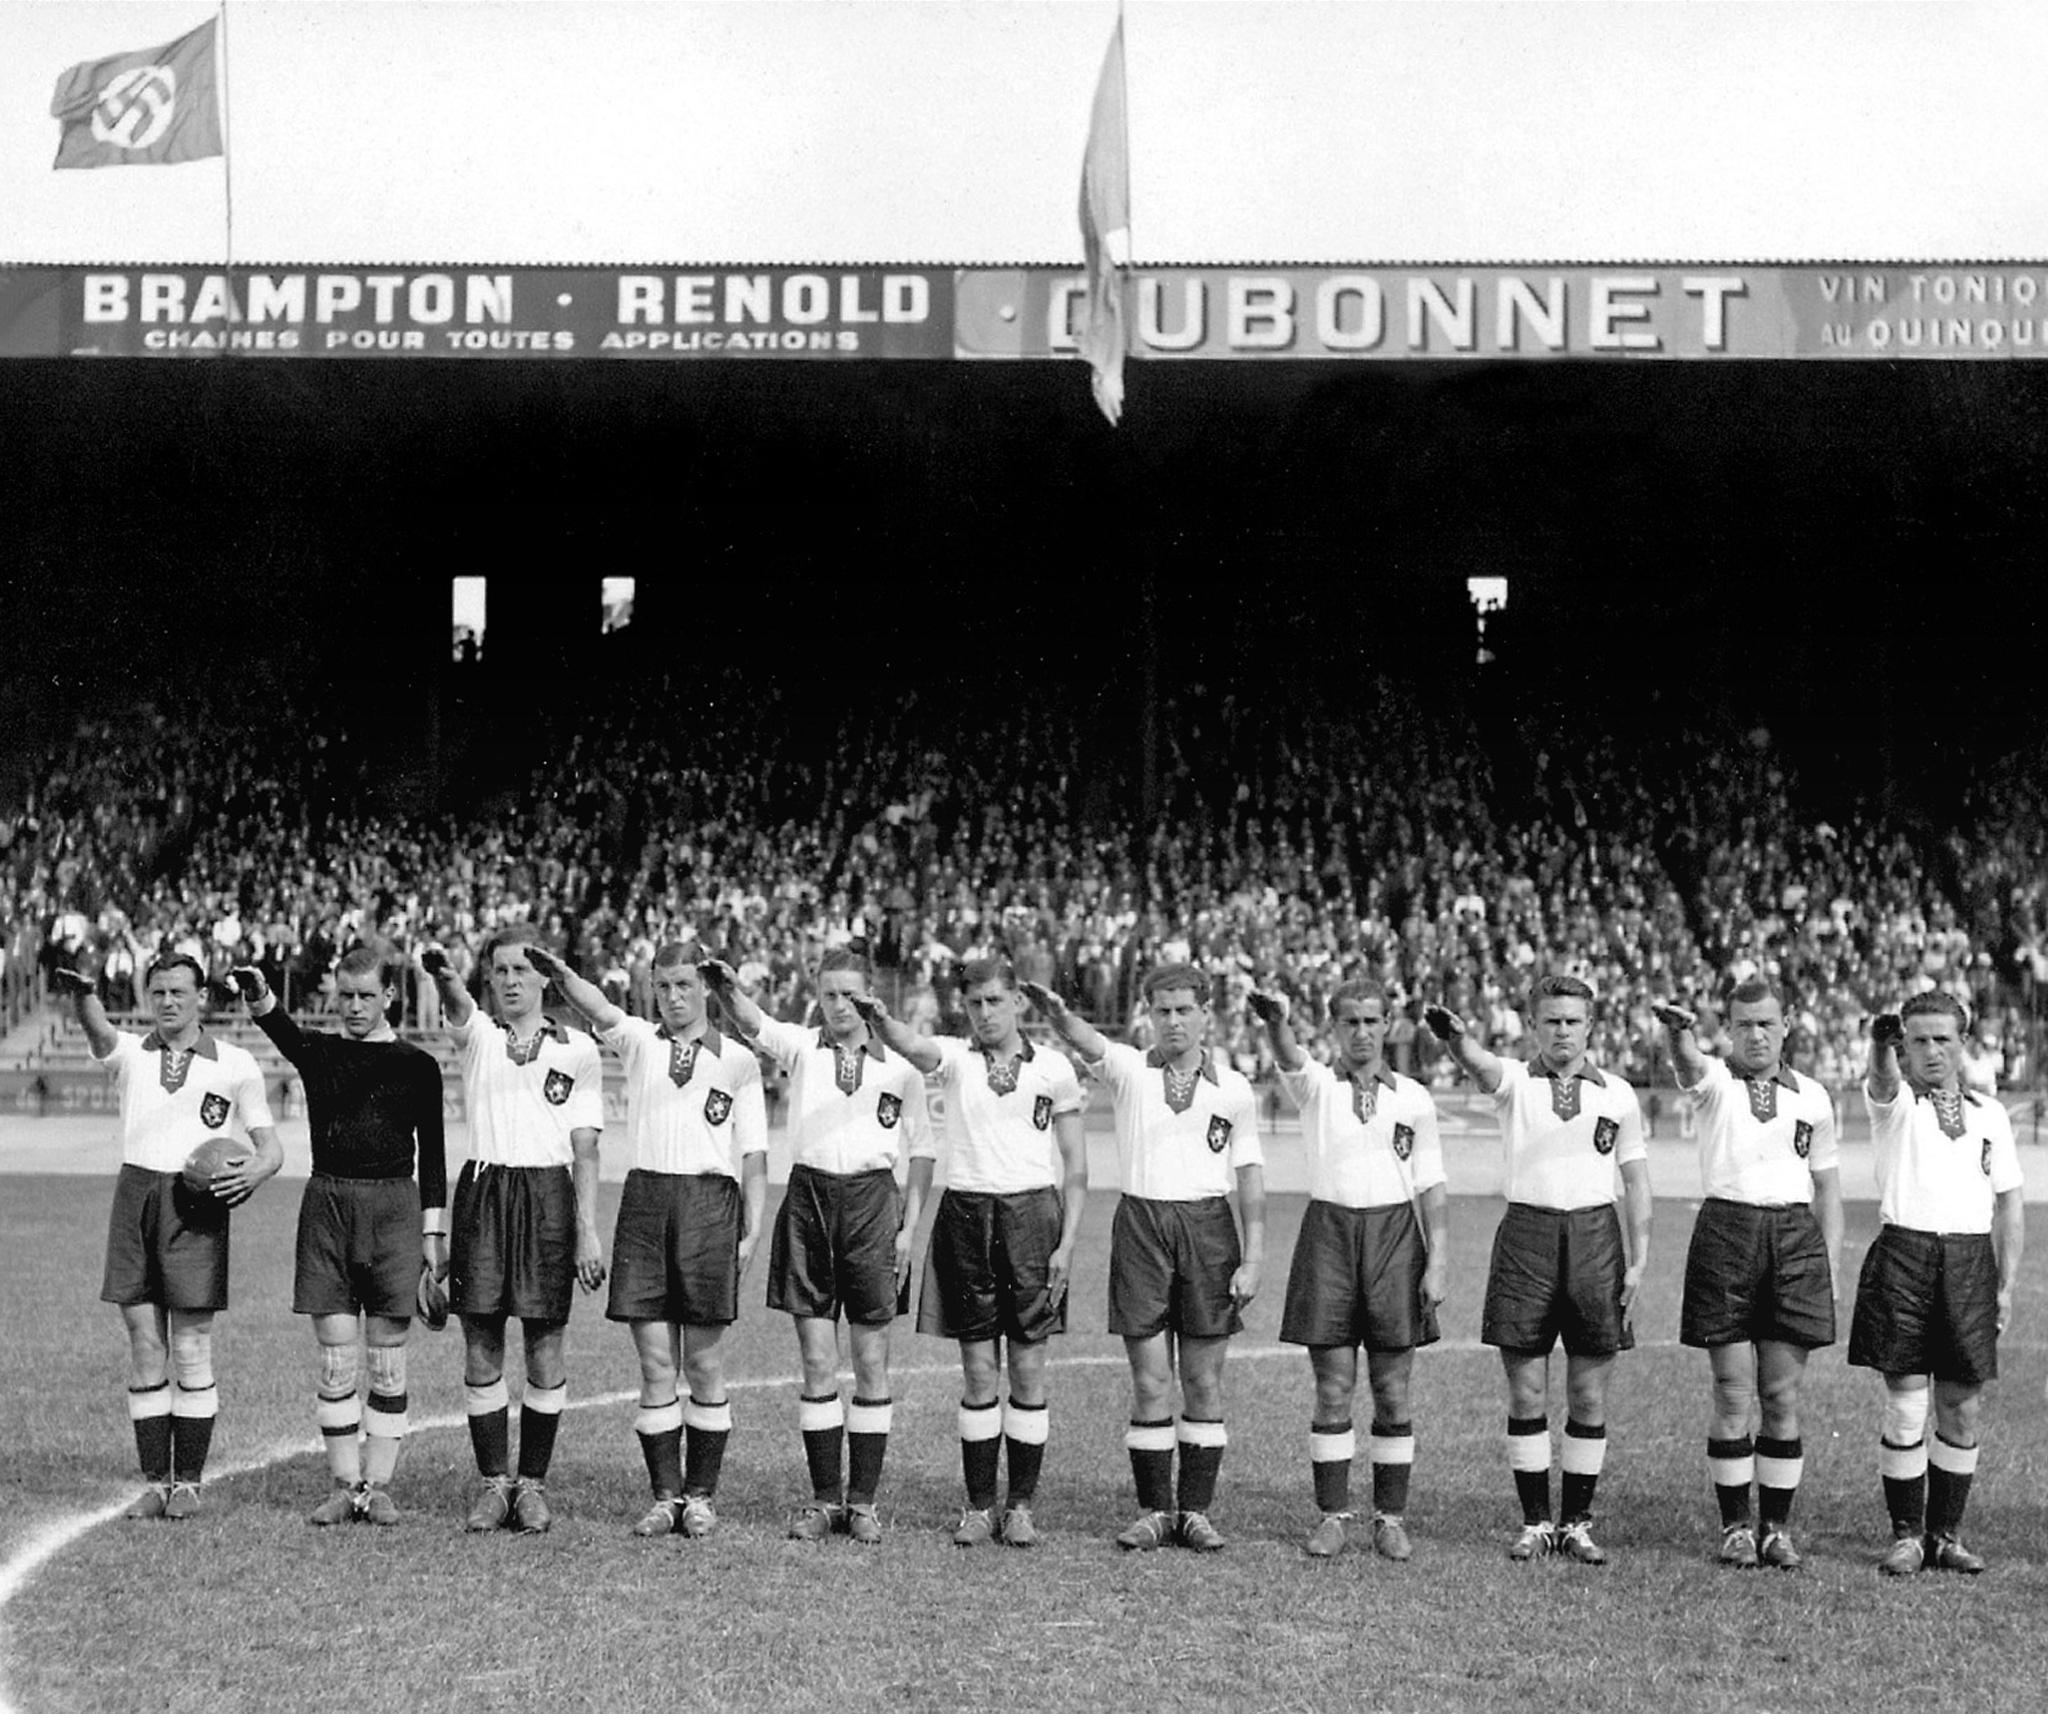 Wm 1938